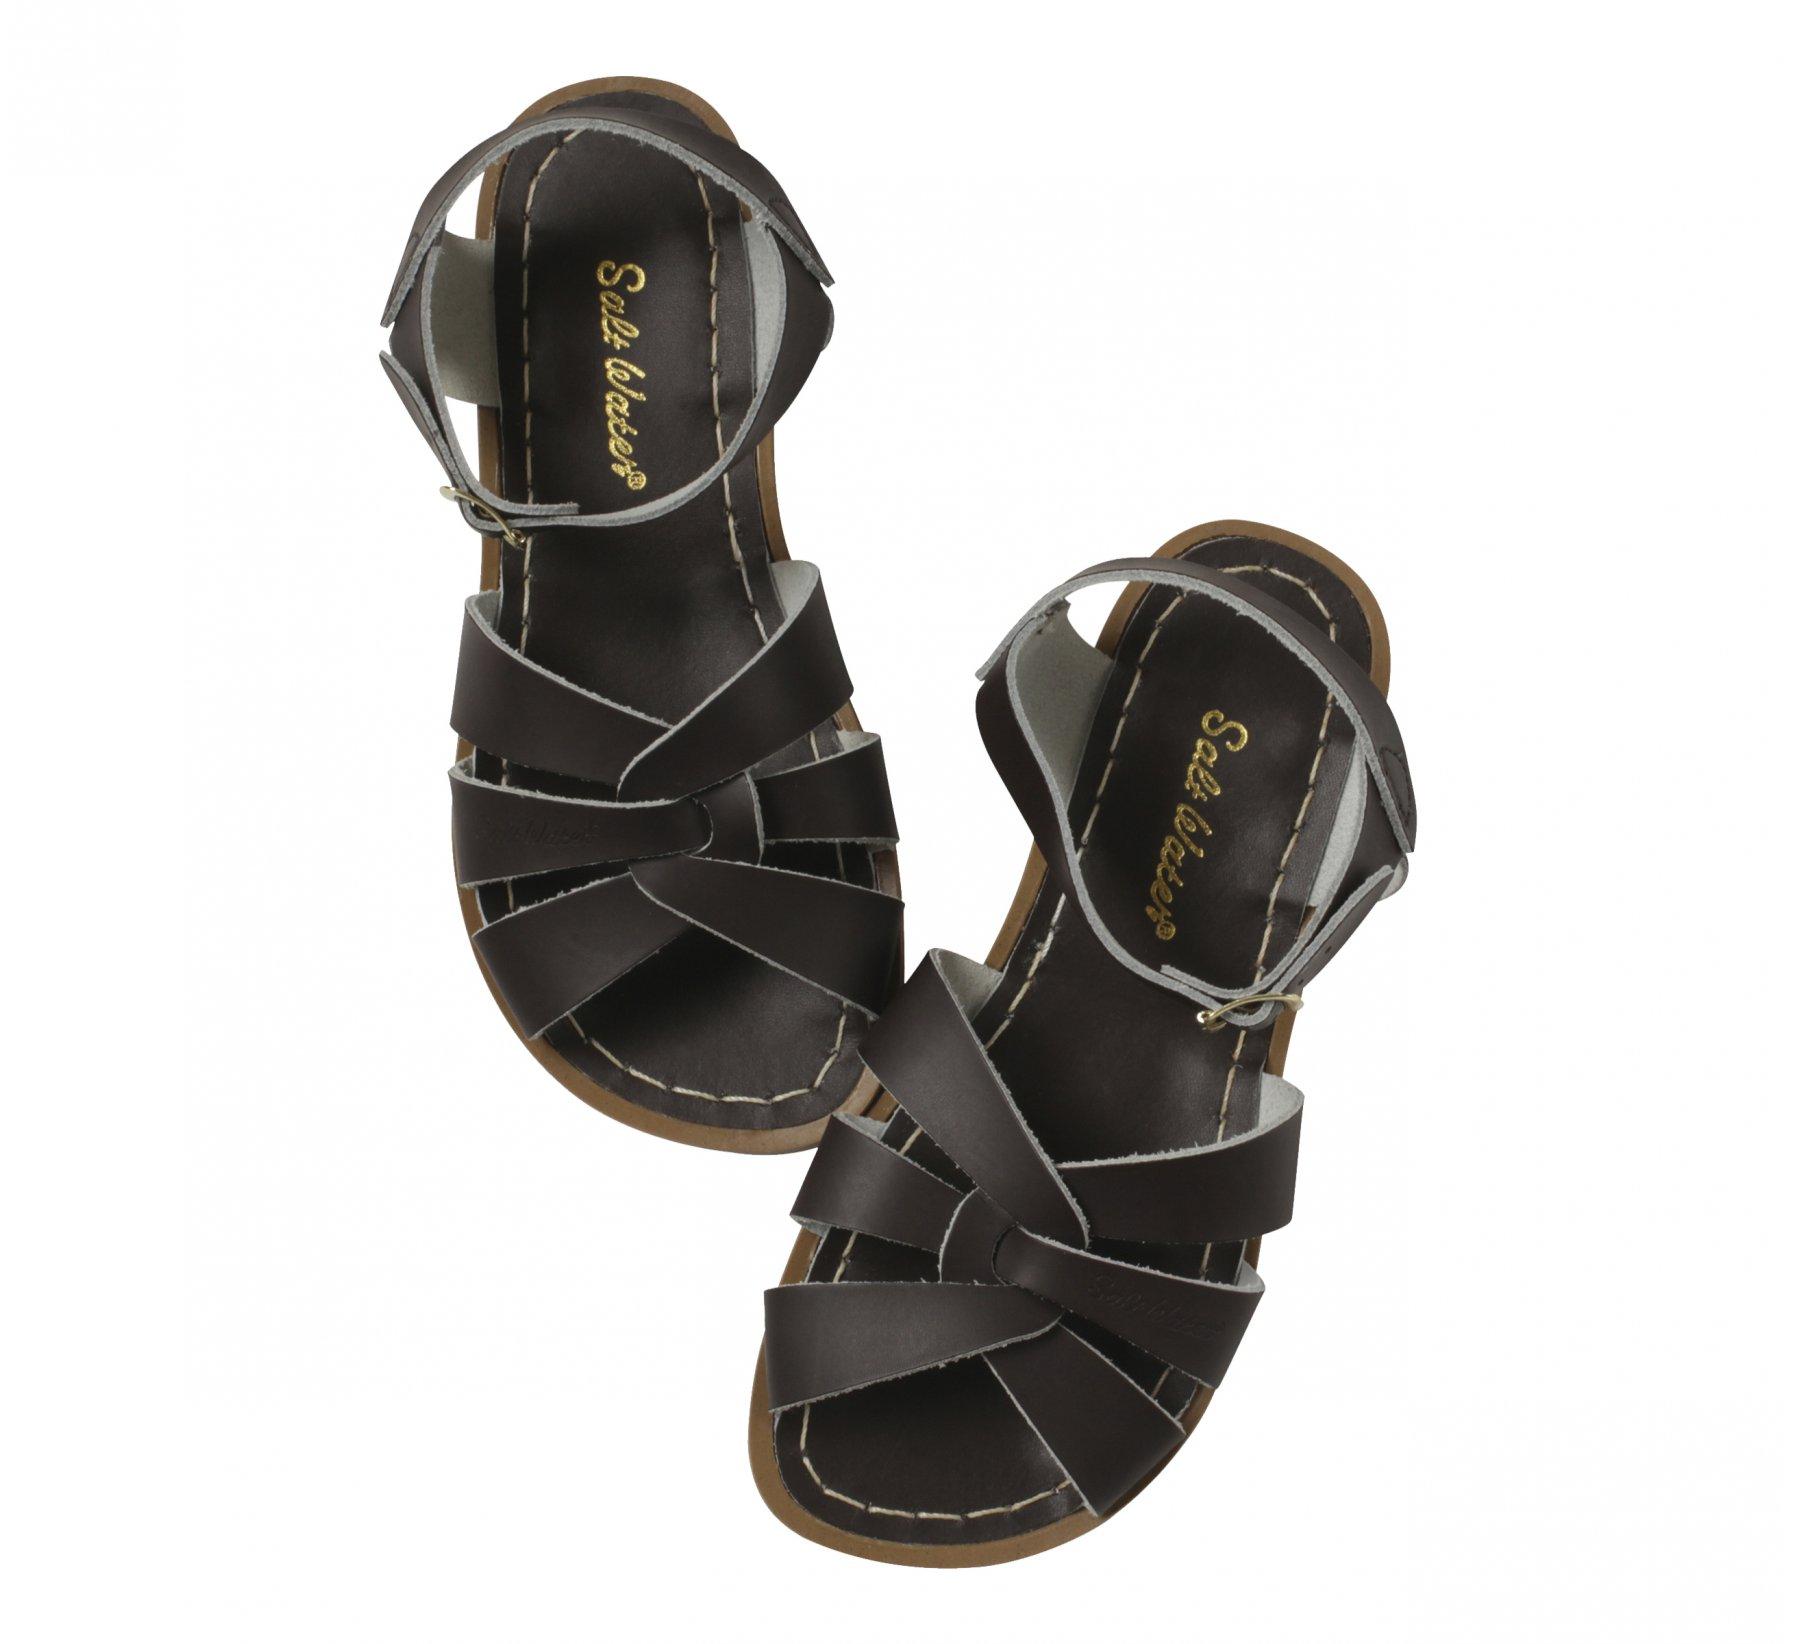 Original Brown - Salt Water Sandals